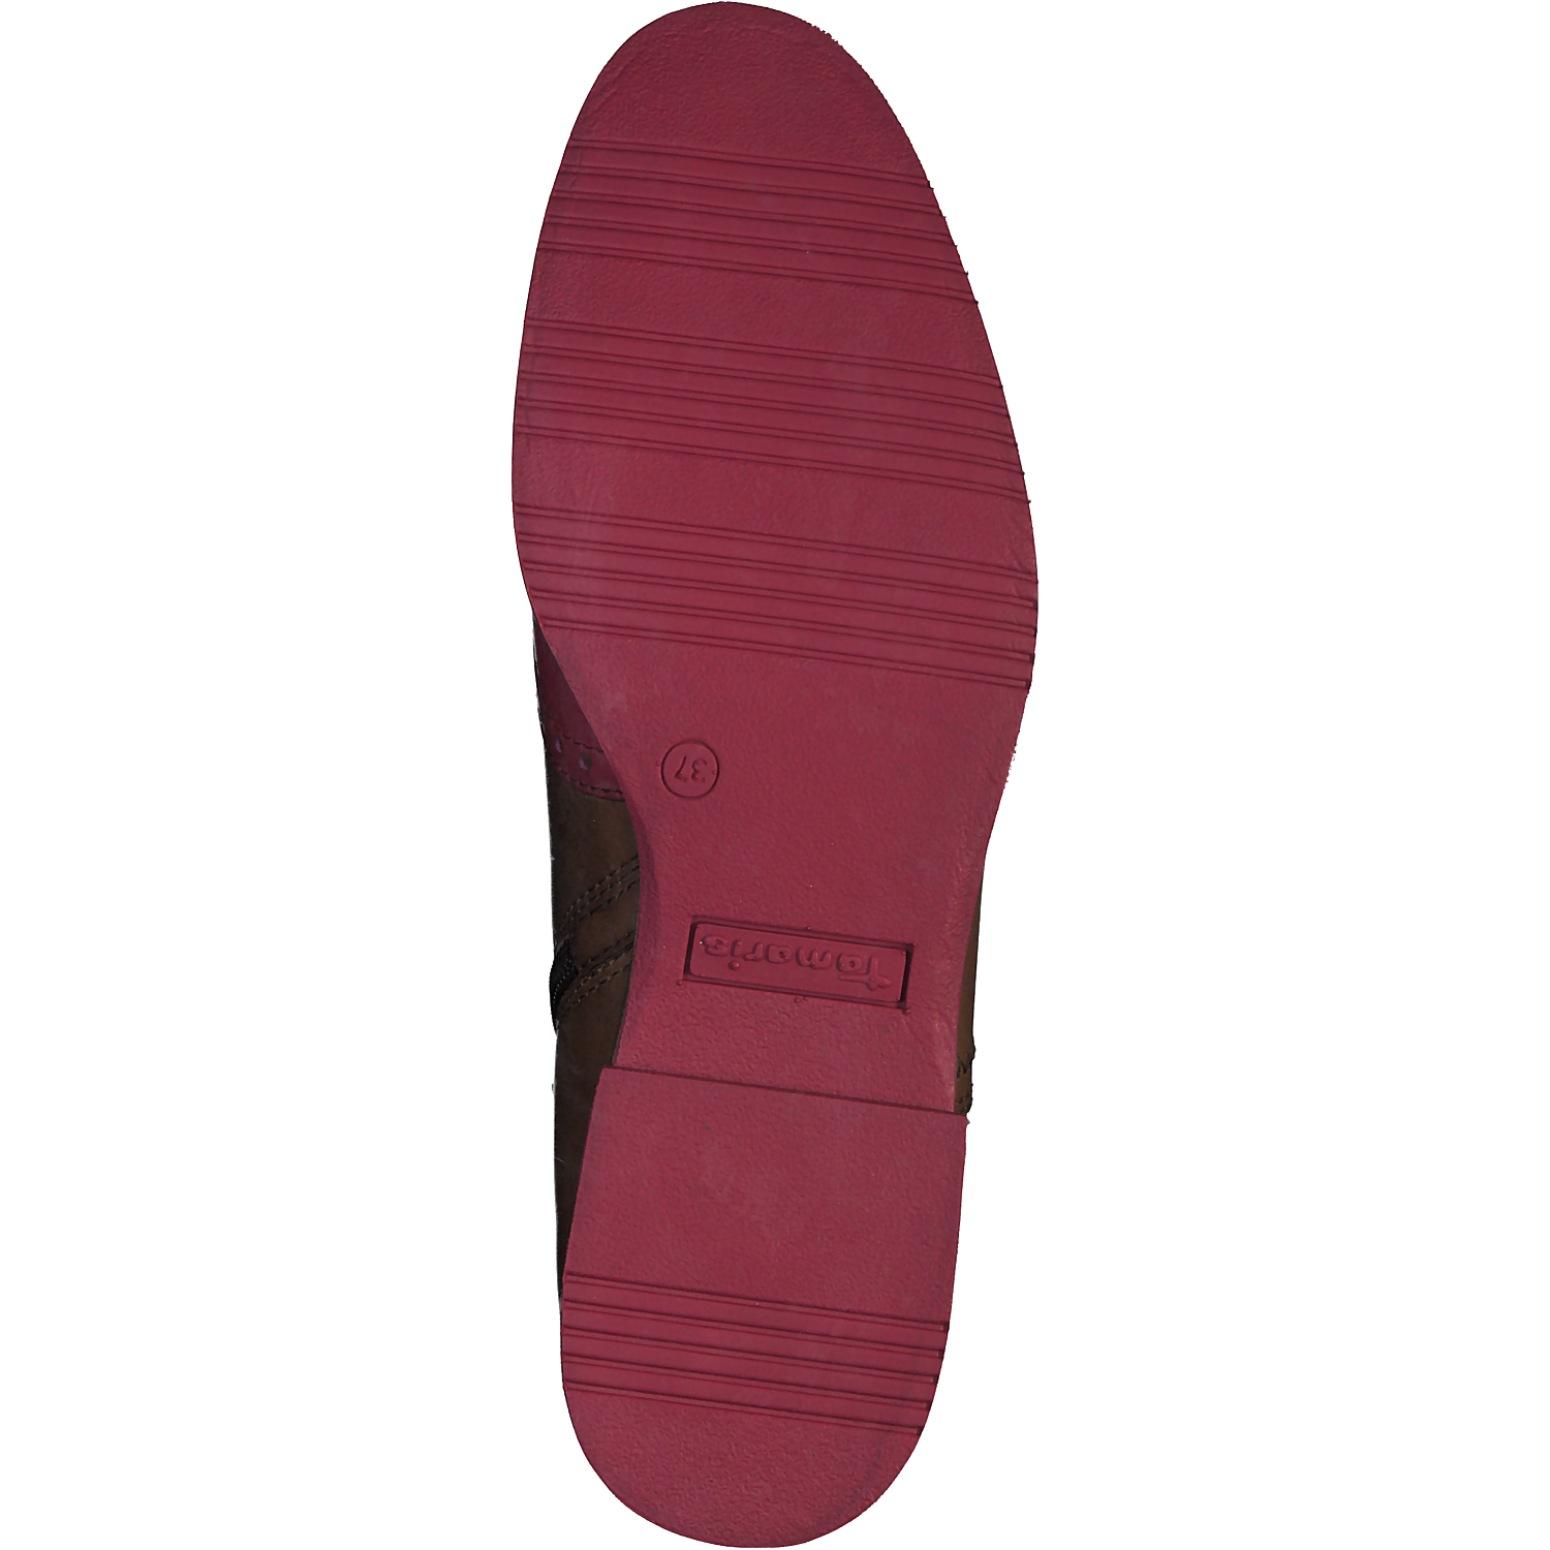 on sale 14d60 68d86 Stiefeletten Boots Tamaris 23 Damen Schuhe Chelsea Leder 1 ...